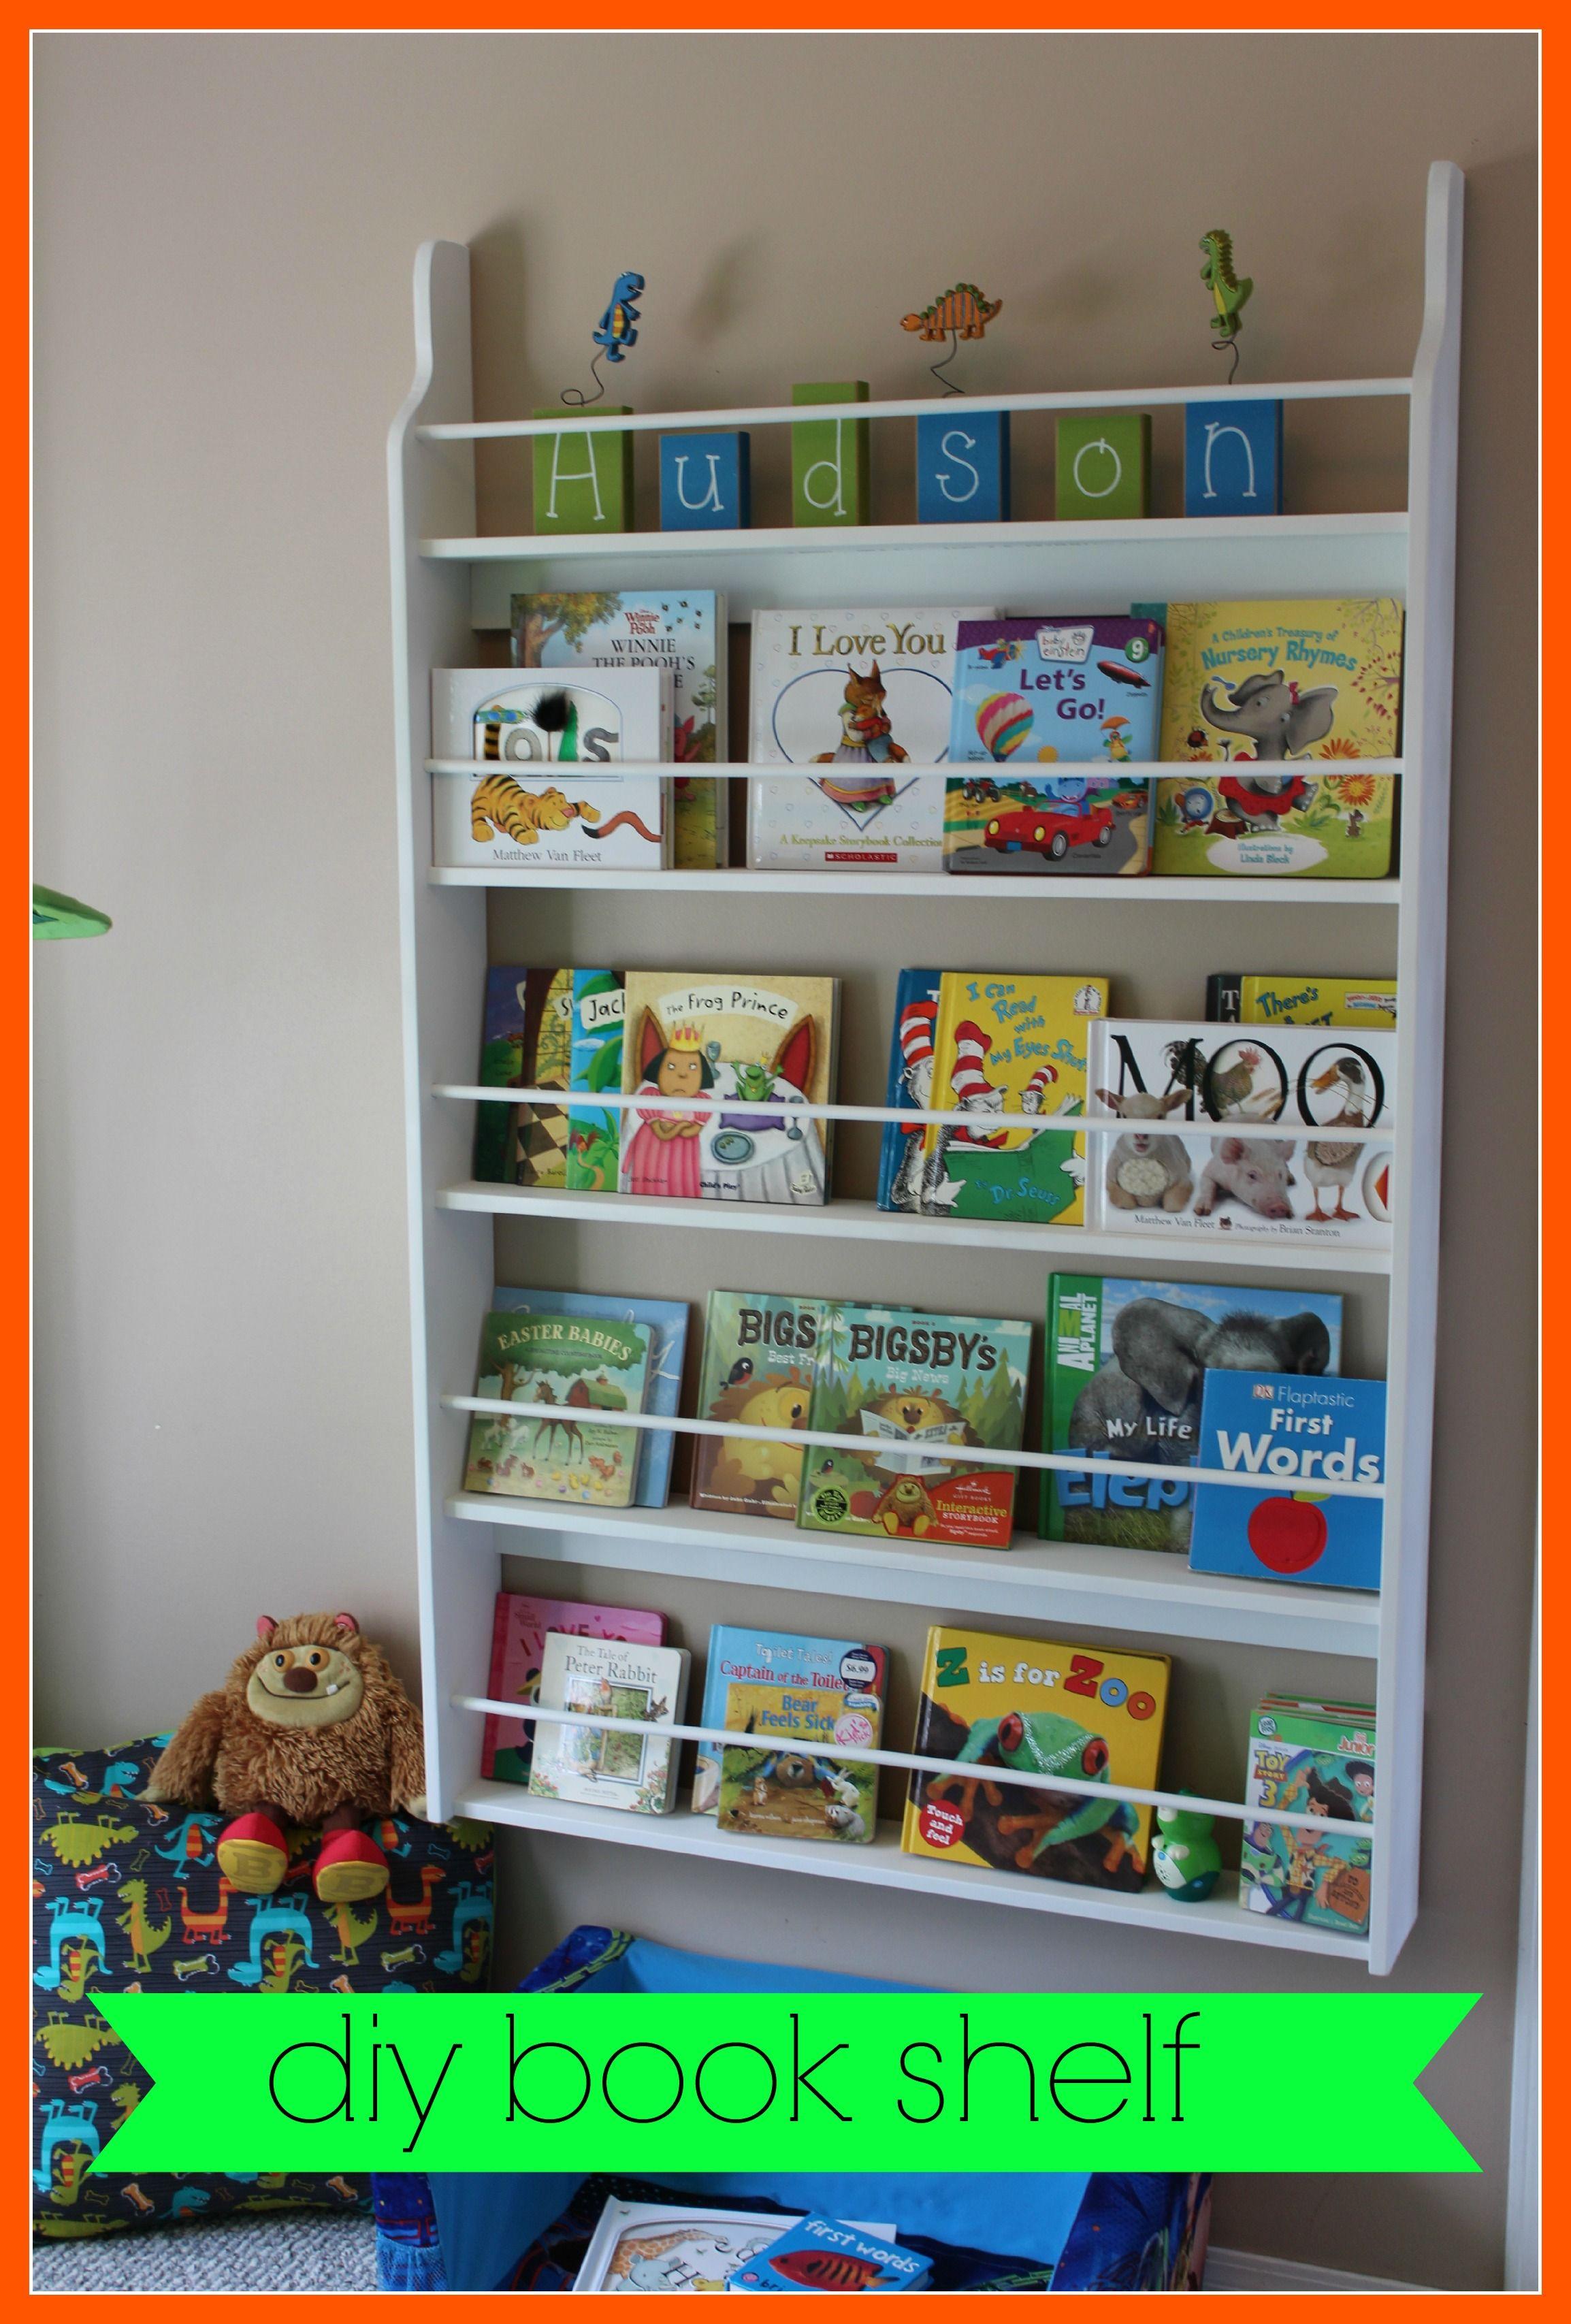 diy book shelf archives my little boy blue para casa 3